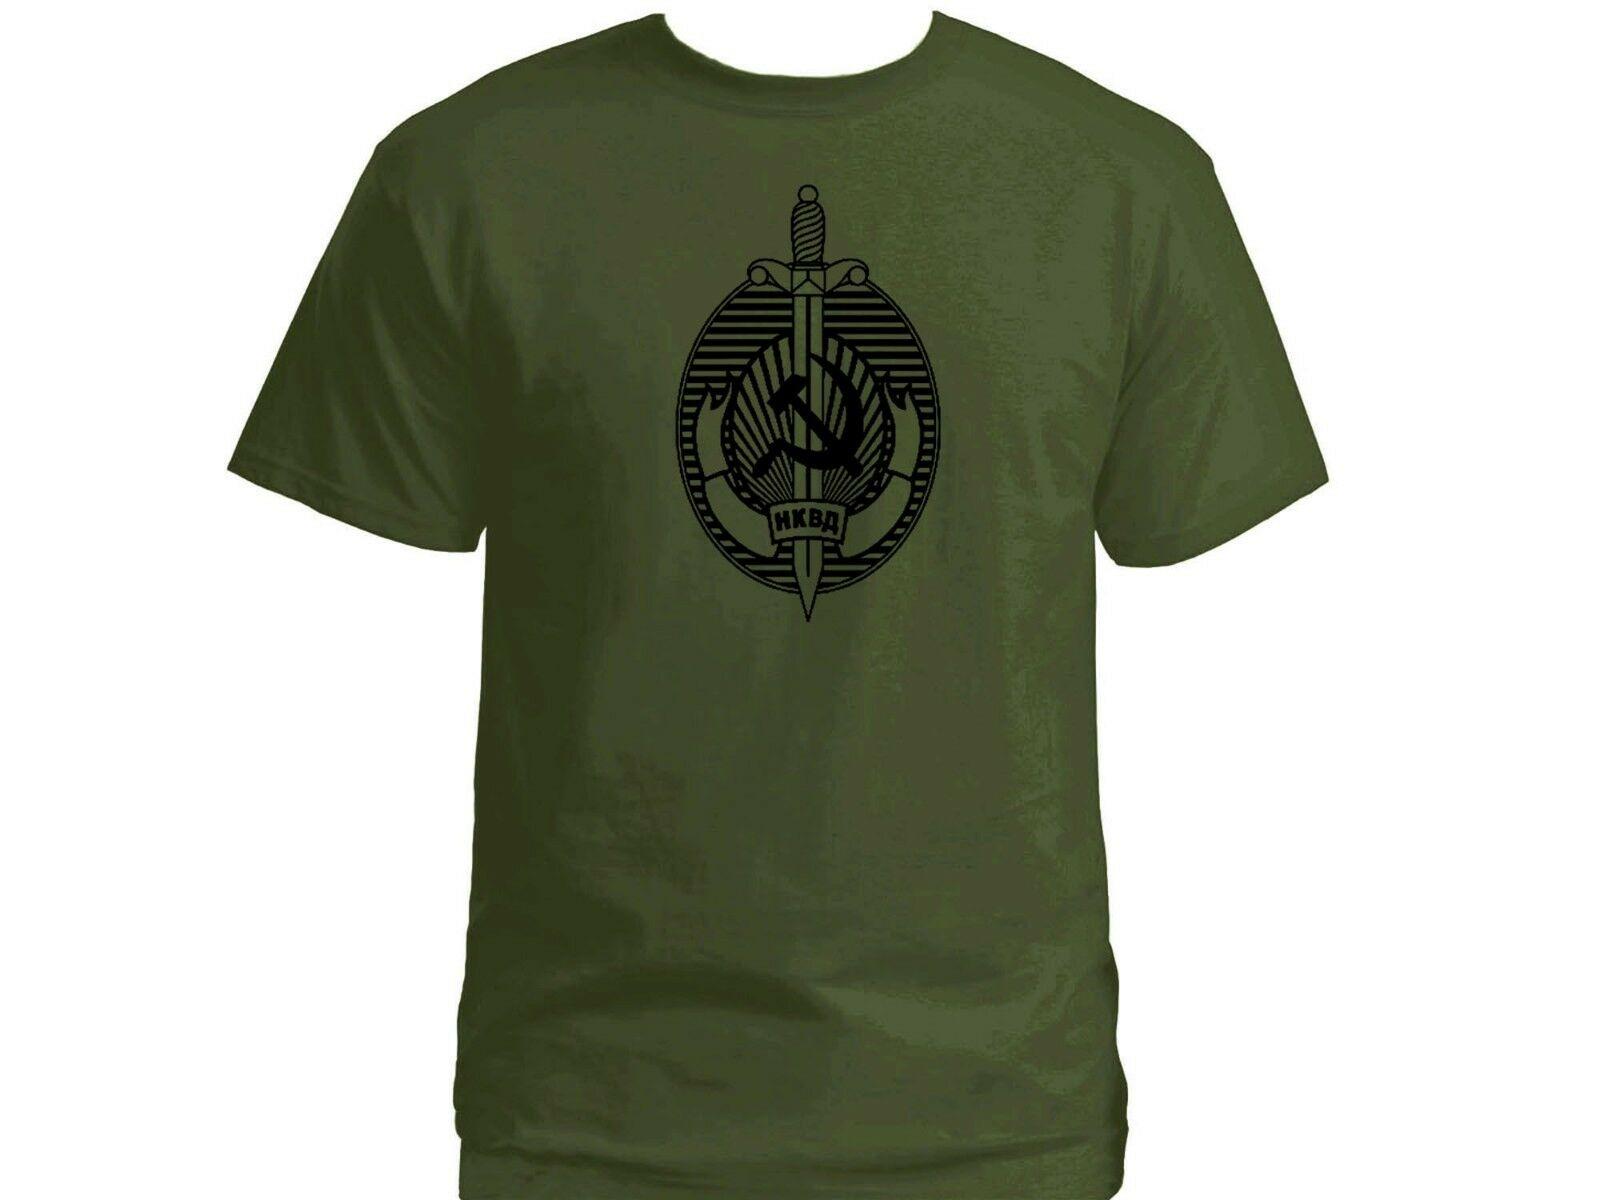 Camiseta rusa NKVD de la antigua KGB, agencia de seguridad comunista soviética, verde militar, Camiseta de algodón de manga corta para hombres, camisetas geniales